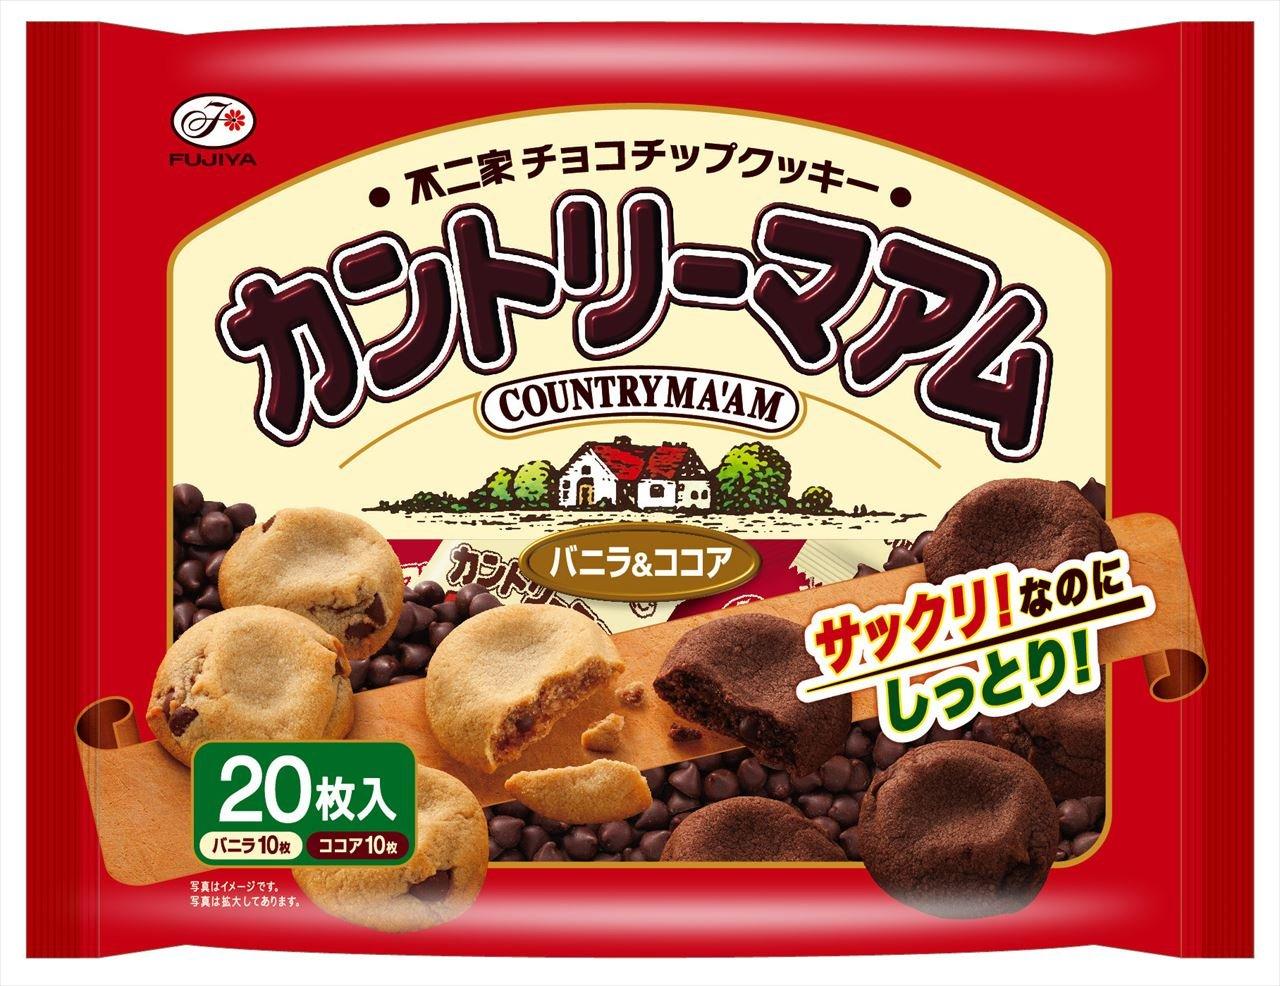 Fujiya Japan Cookie COUNTRY MA'AM (vanilla and cocoa) 20 pcs x 12 bags